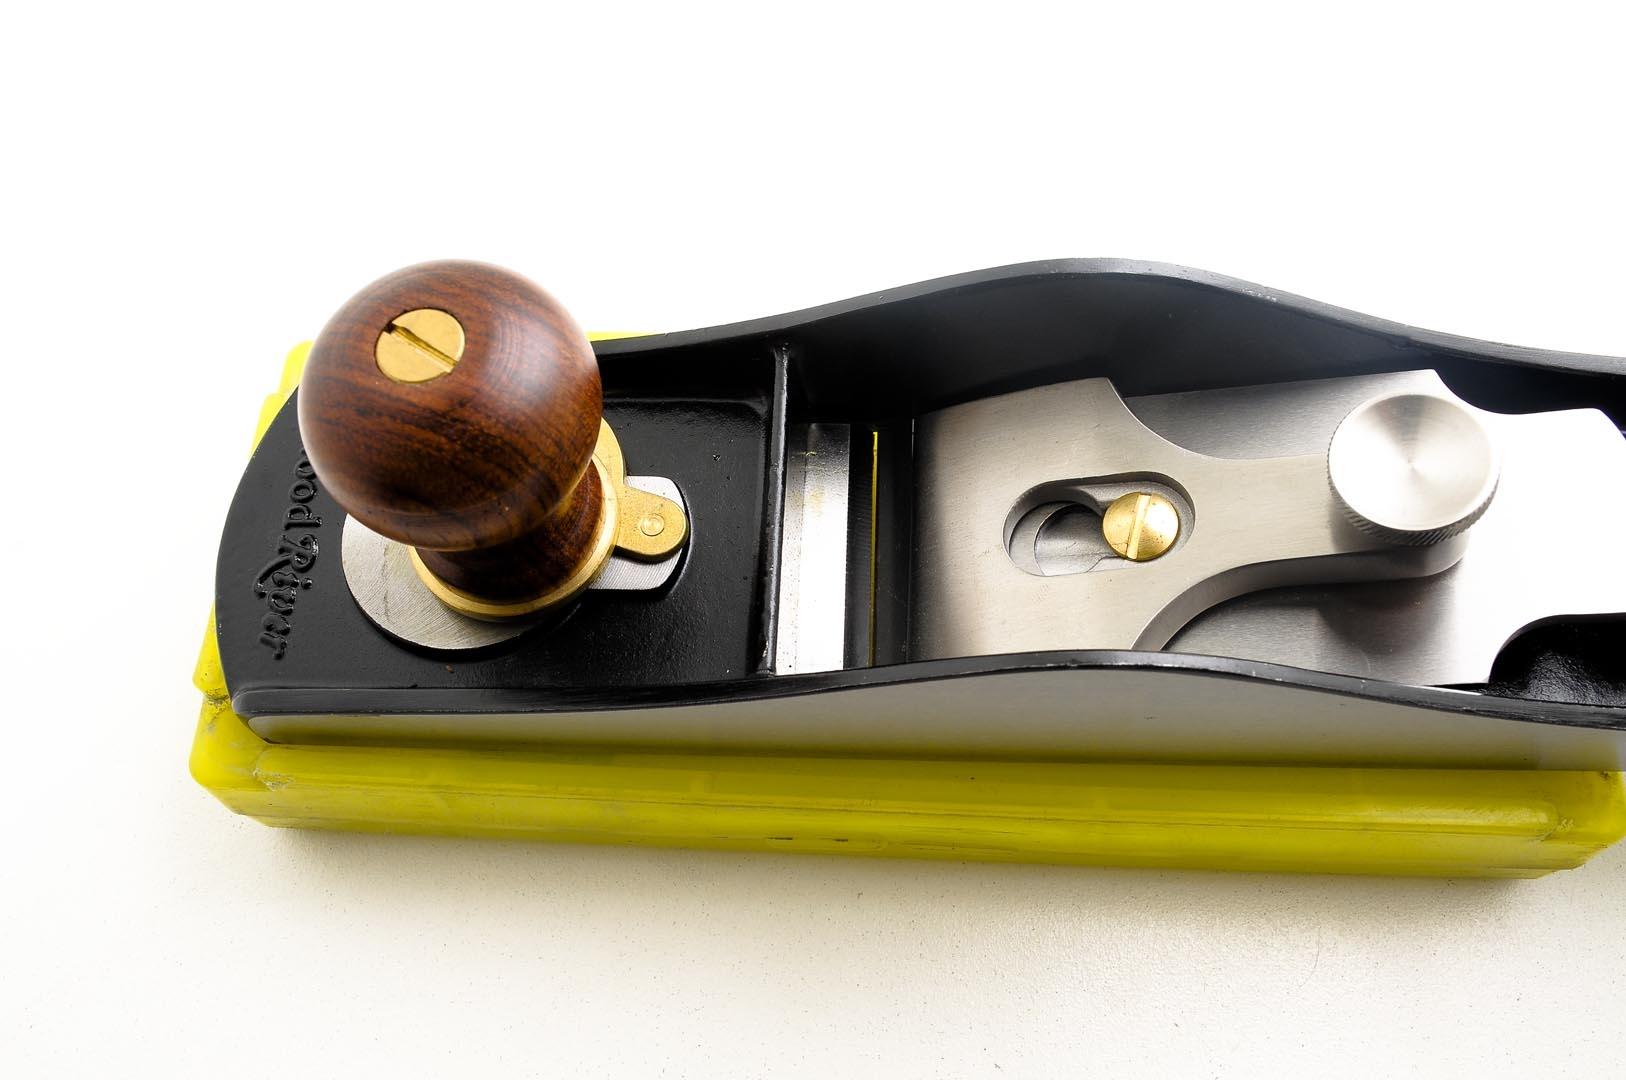 158755-Cepillo 62 multifuncional garlopin cama baja con hoja 25° WoodRiver 158755-max-5.